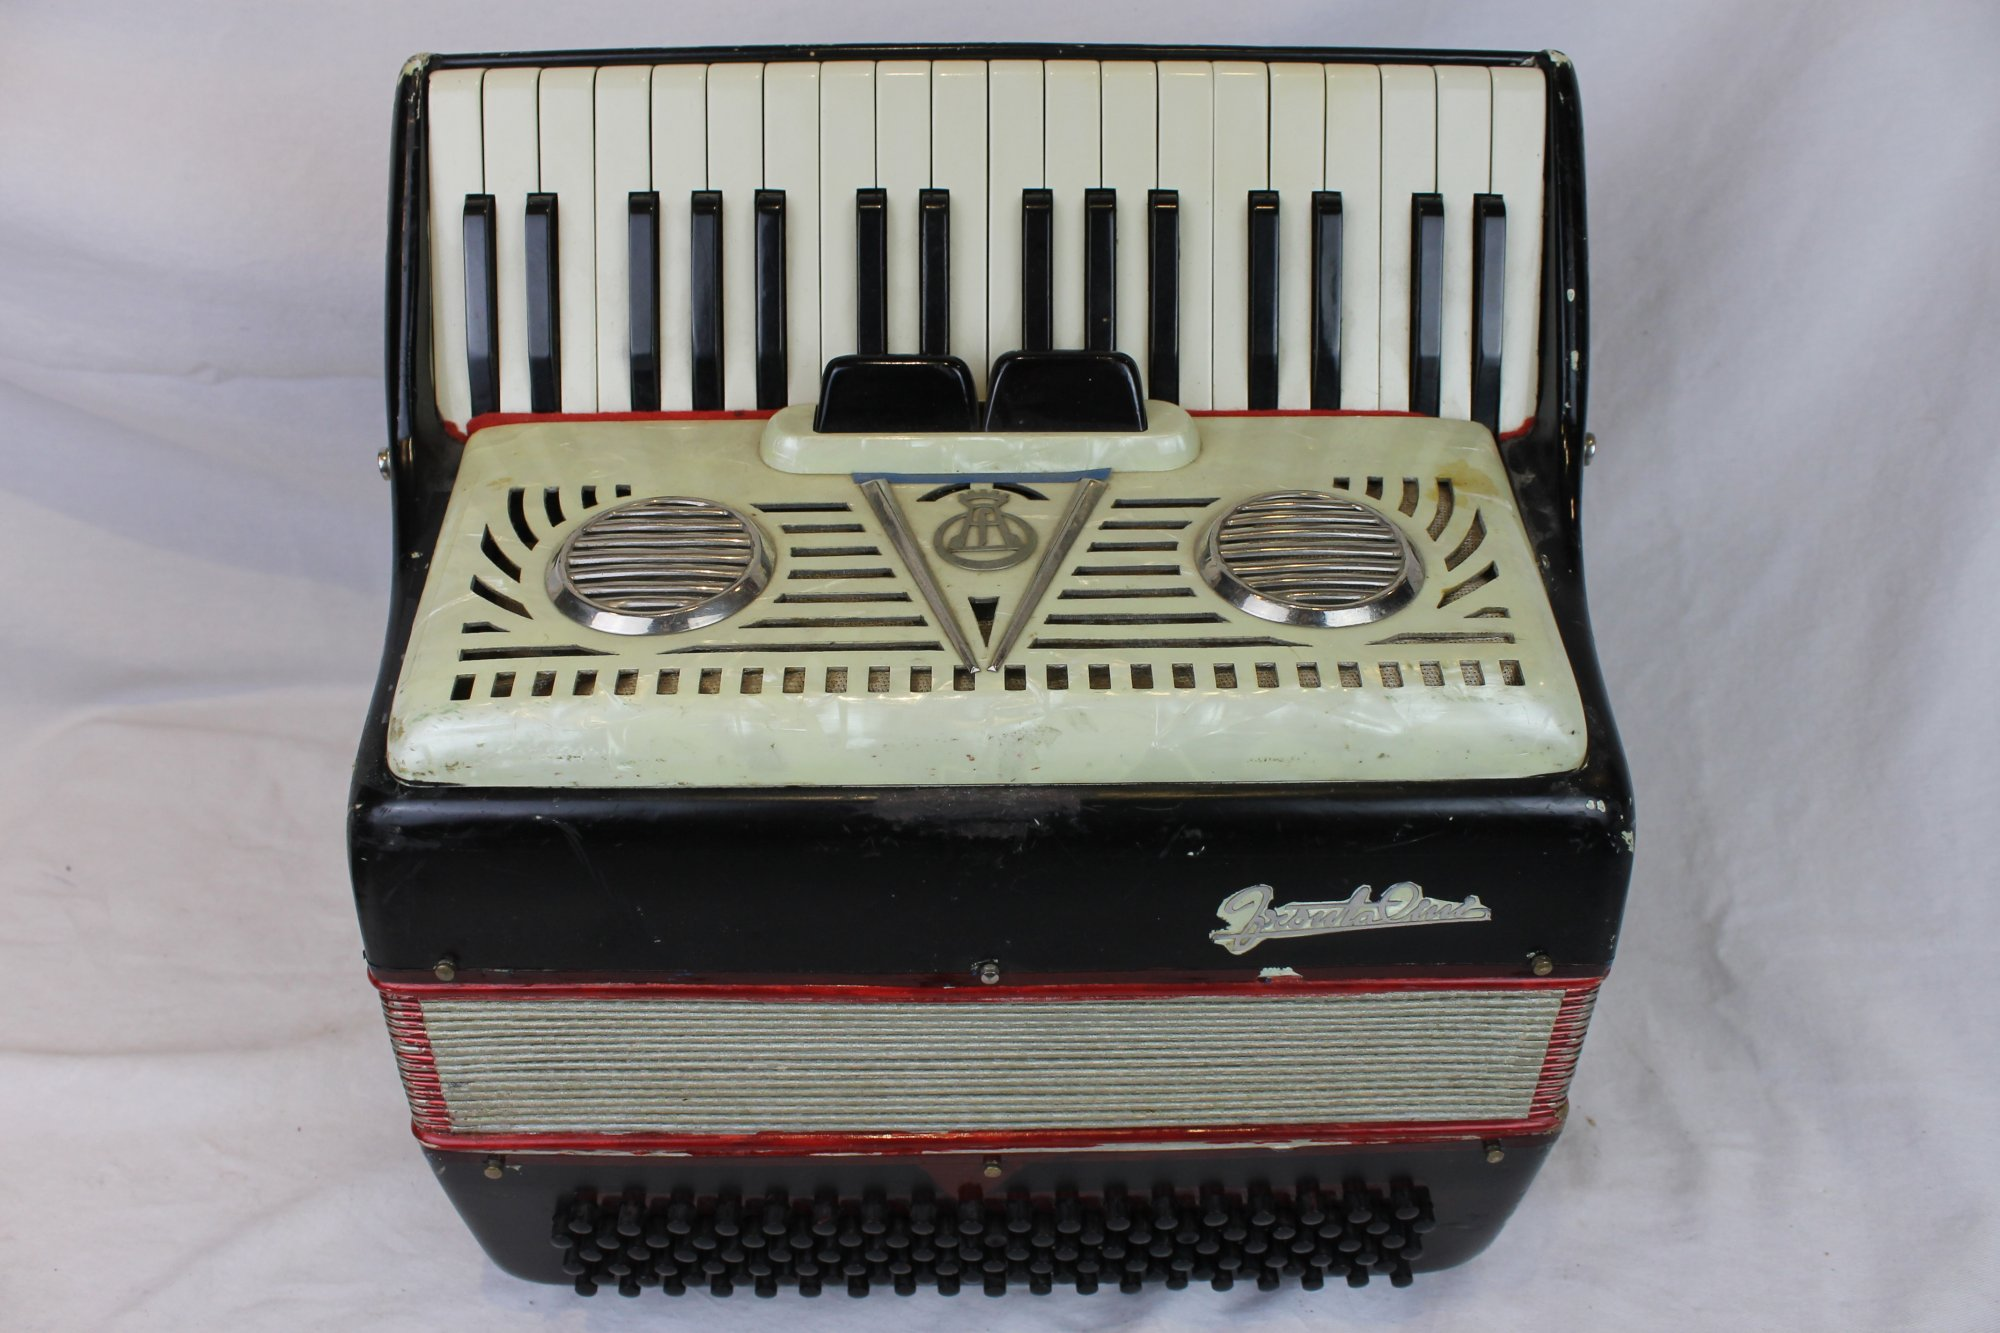 6082 - Black Frontalini Piano Accordion 34 111 - Treble Only, No Bass Blocks